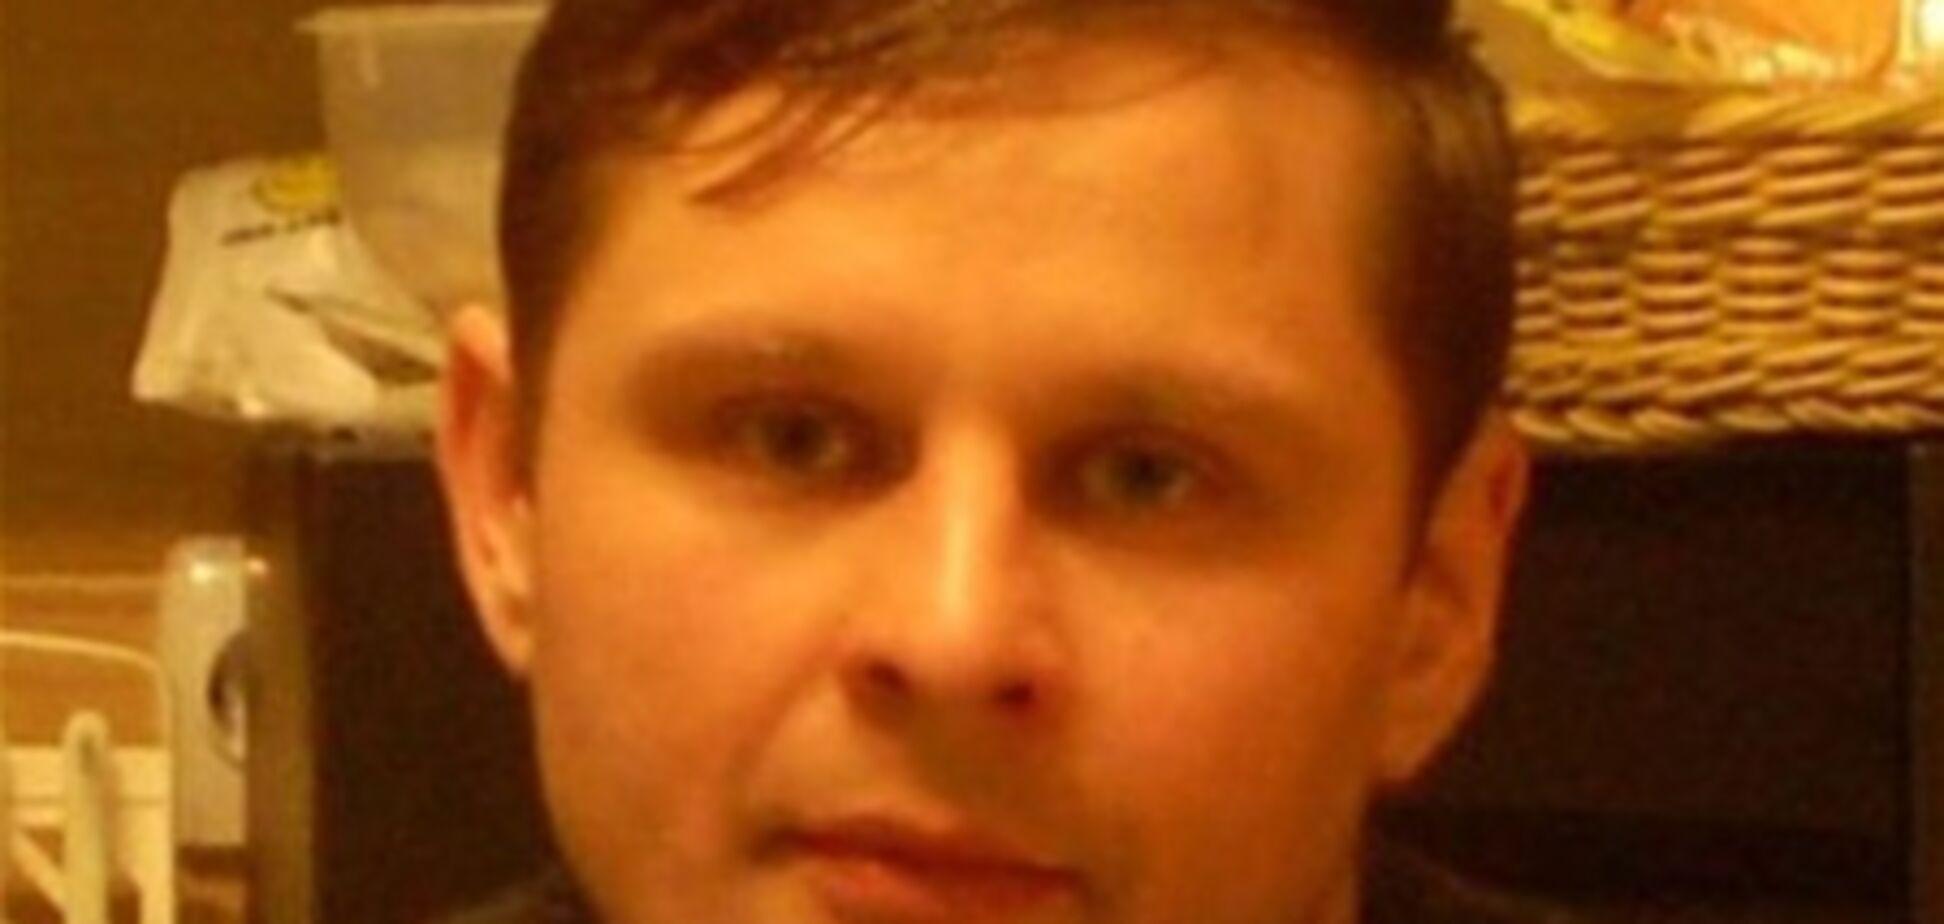 Милиция насчитала Мазурку уже 20 убийств